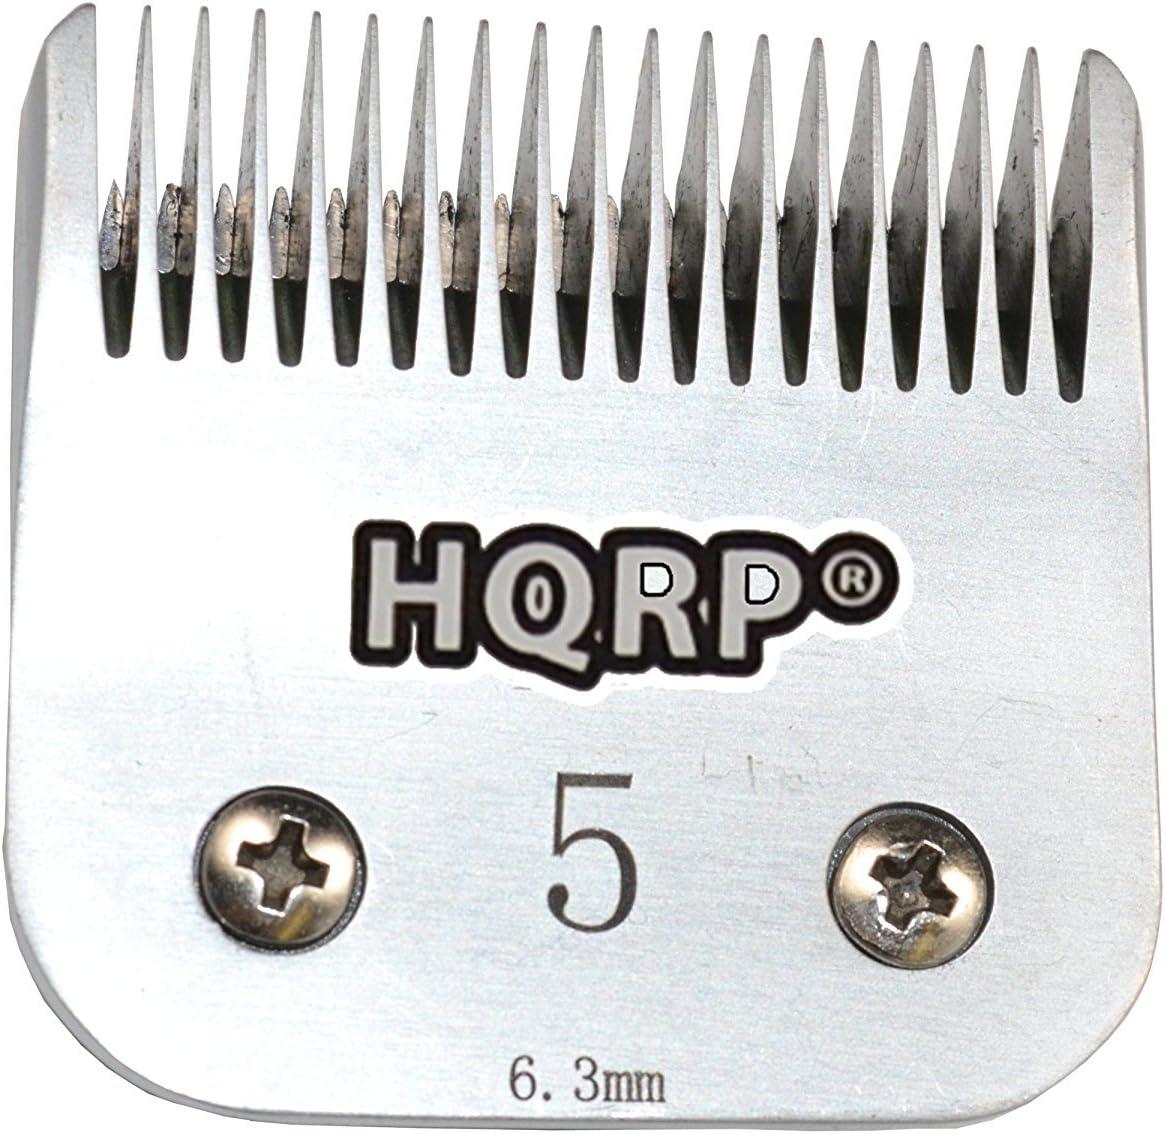 HQRP Cuchilla de cortapelos de animales [tamaño 5FC] para Oster A5/A-5 Turbo 2 velocità 078005-314-002/Golden A5/Turbo A5 Posavasos